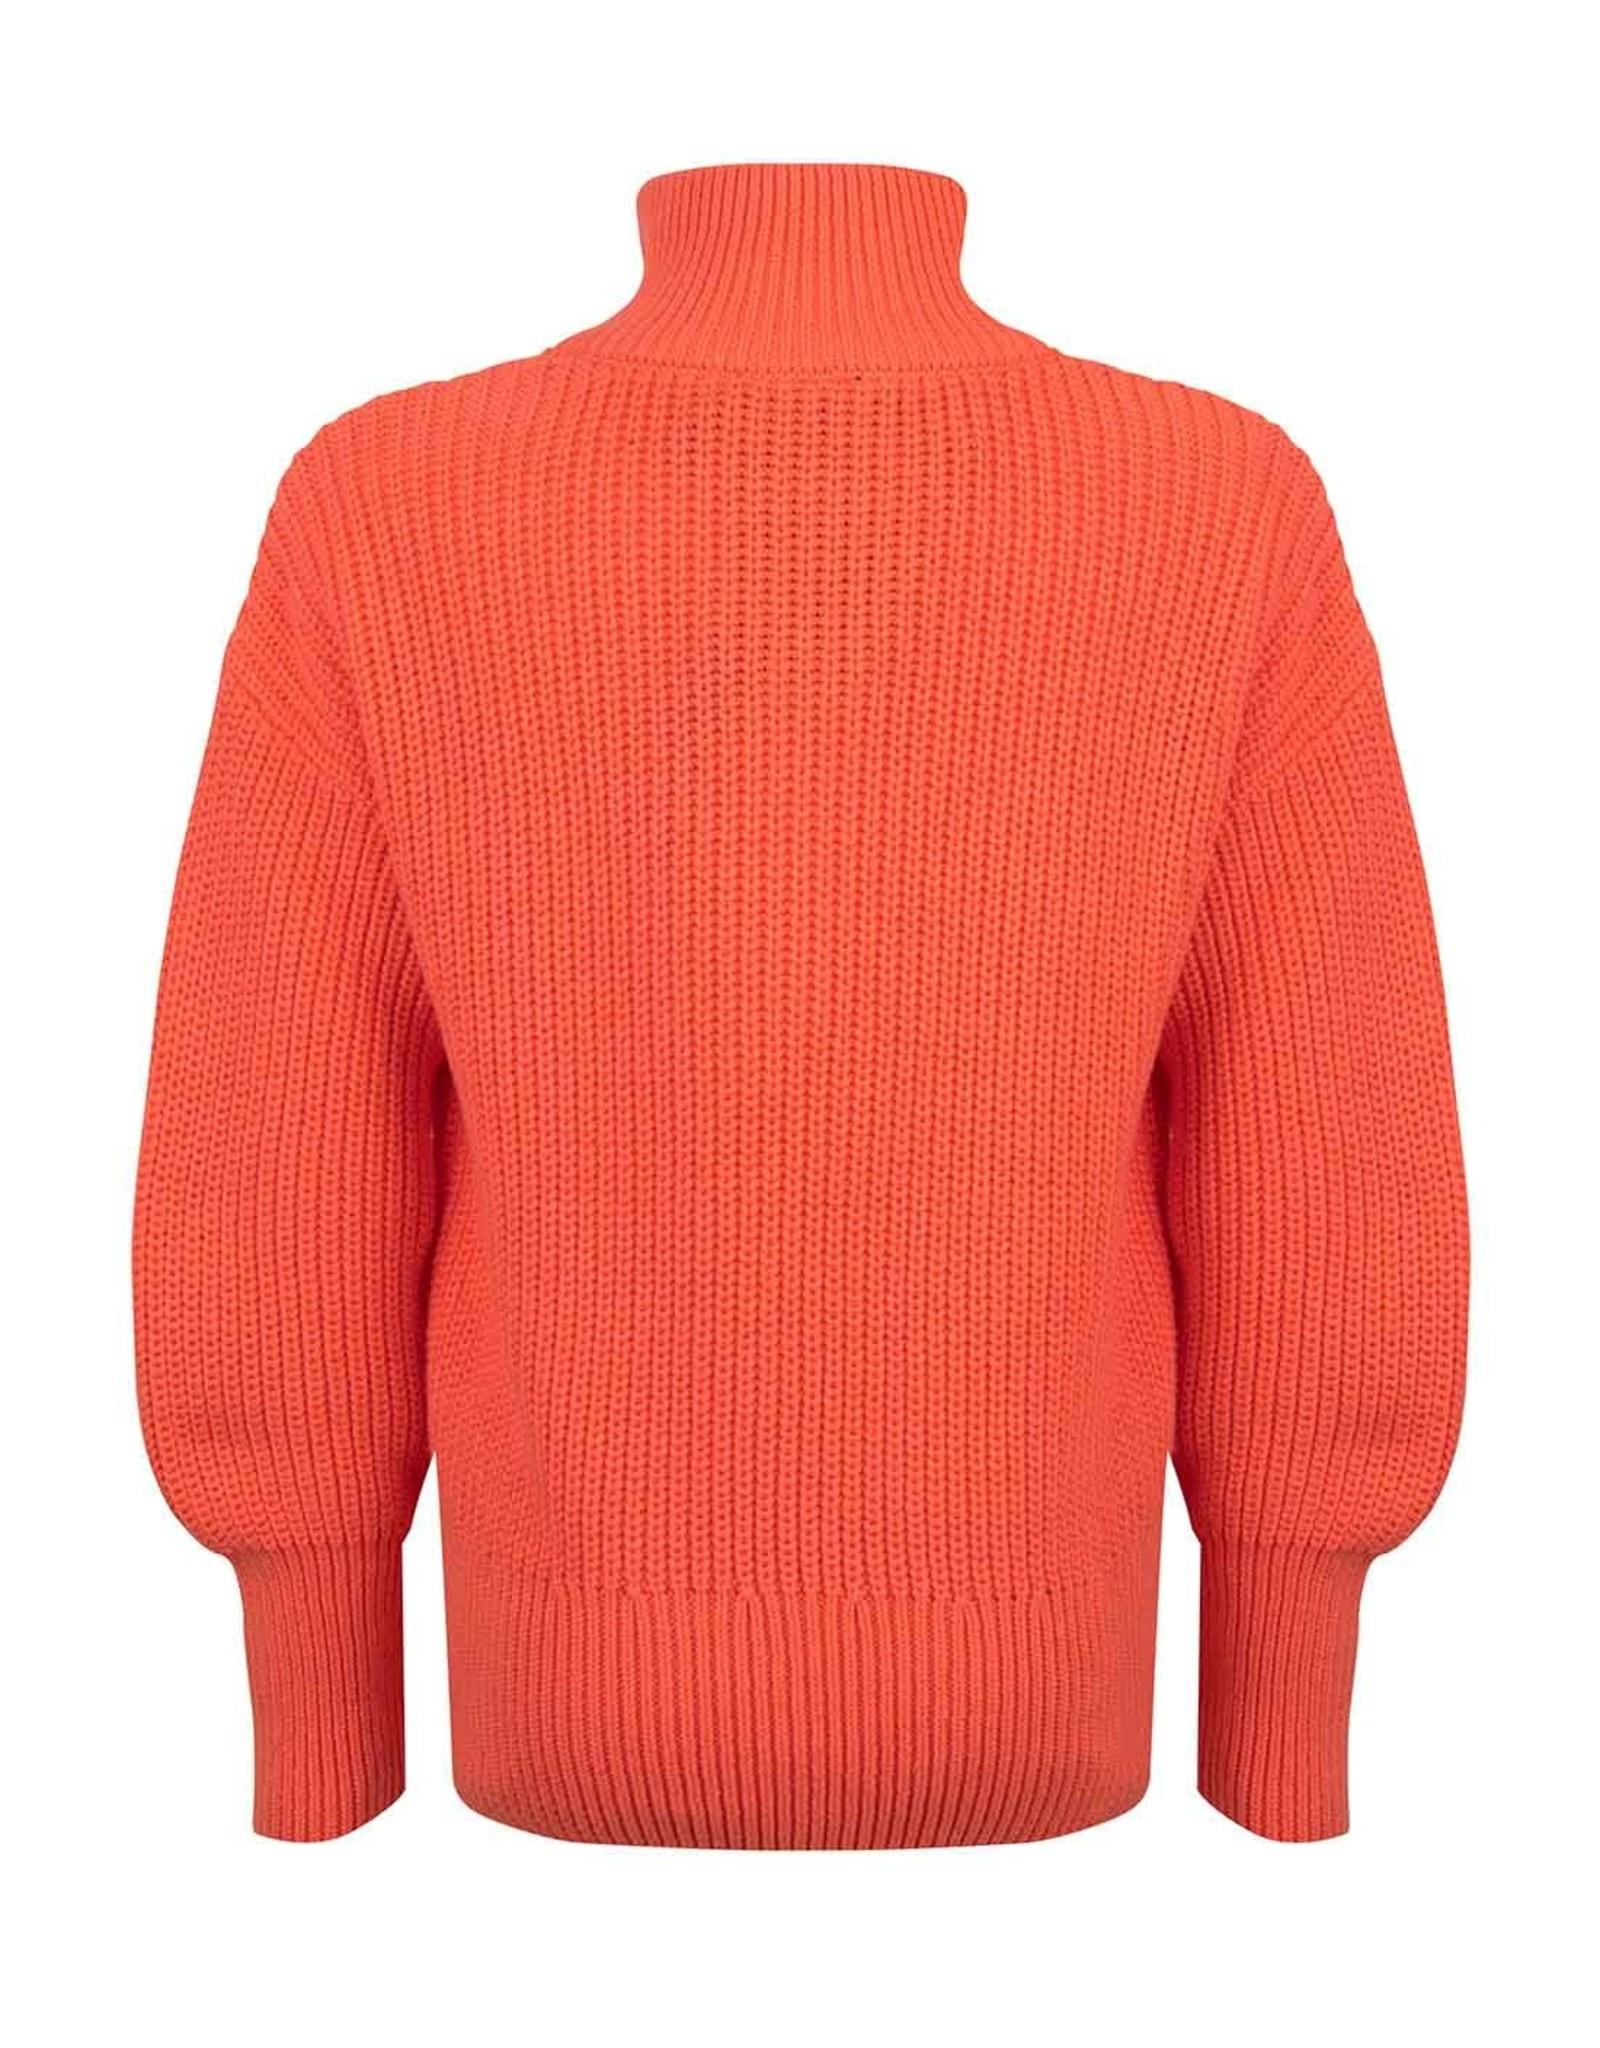 Indian Blue Jeans Indian Blue meiden gebreide sweater met rits Warm Coral